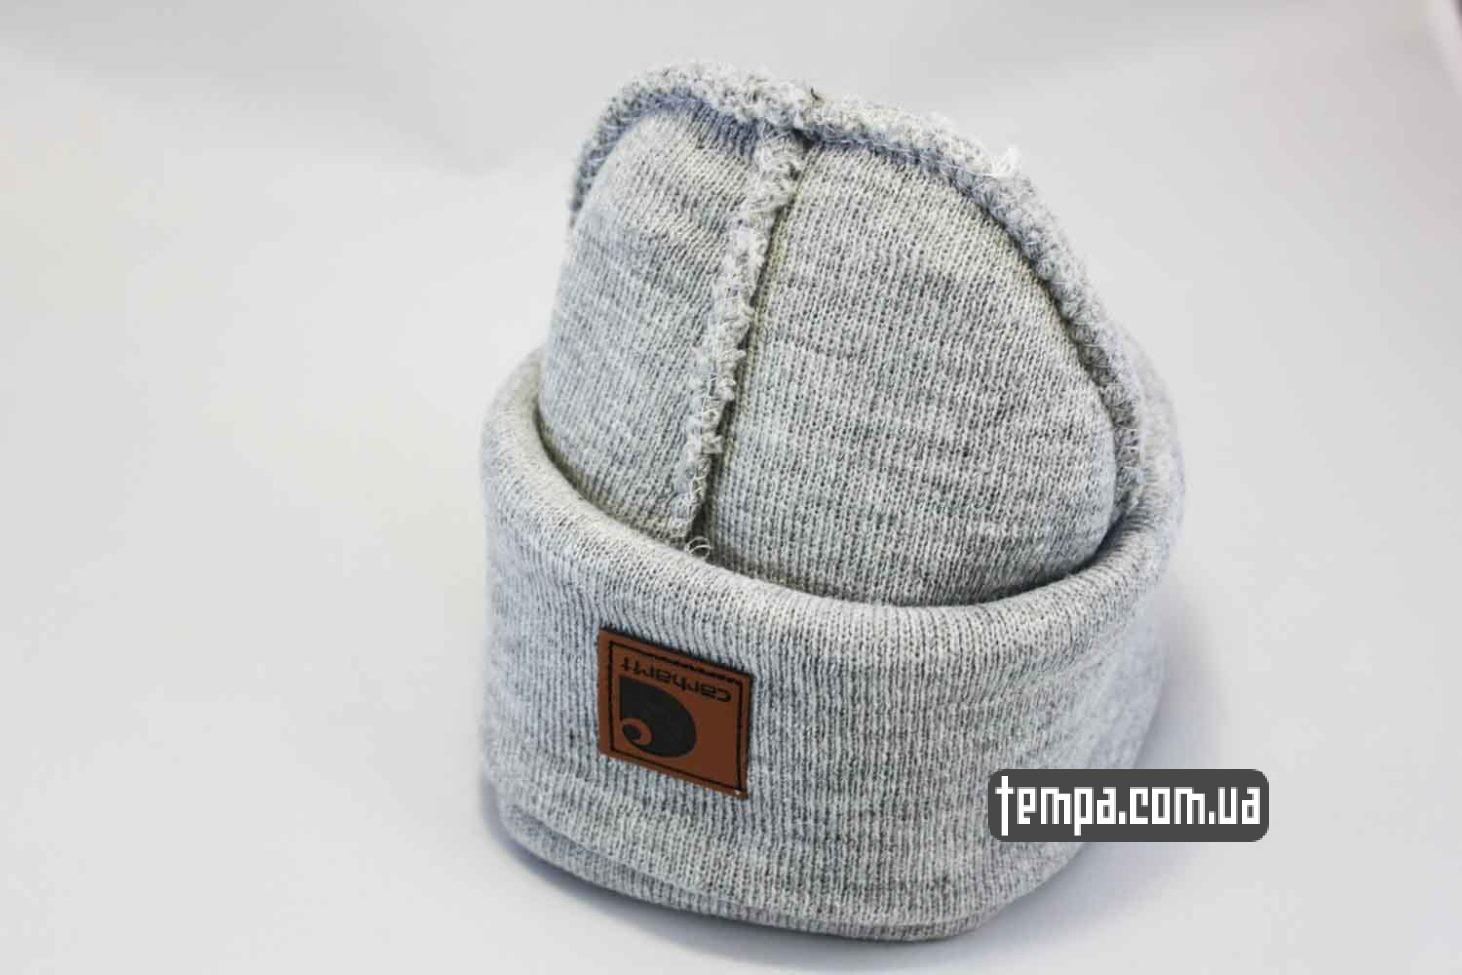 теплая зимняя шапка beanie Carhartt серая кожаный логотип